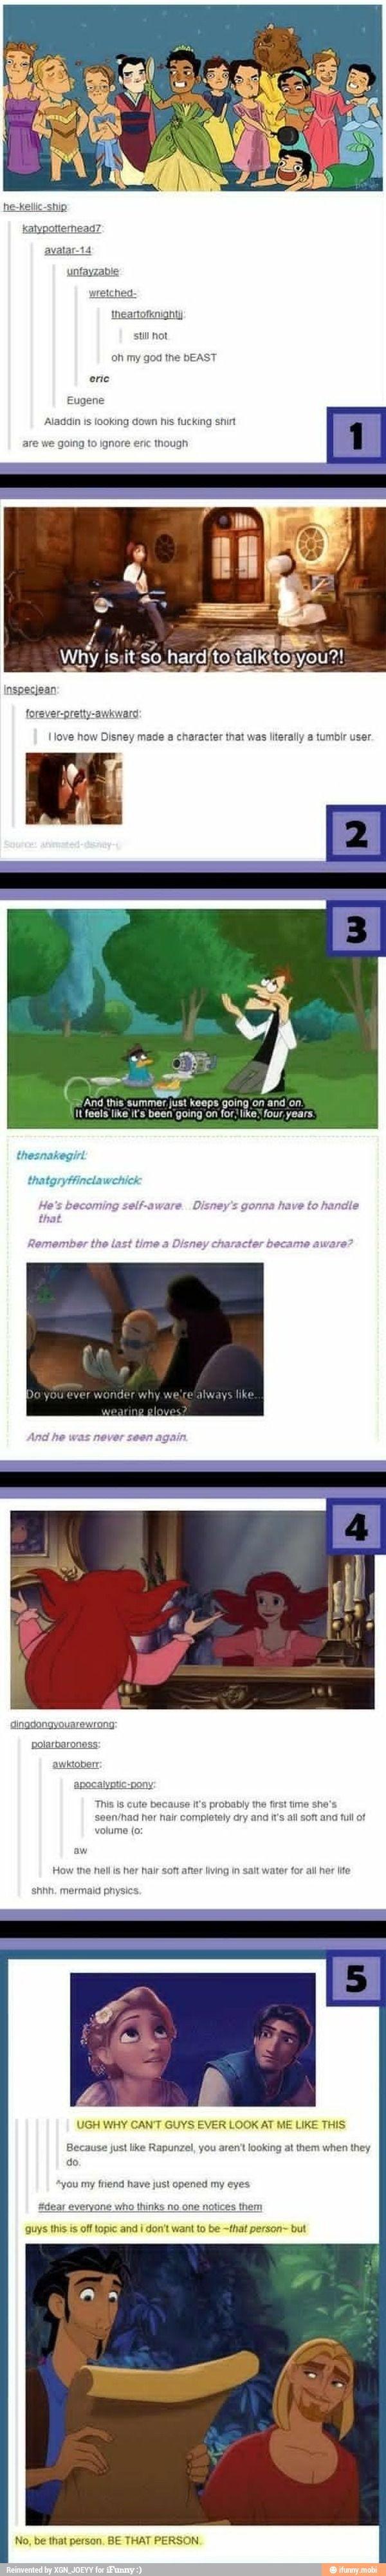 Disney funnies